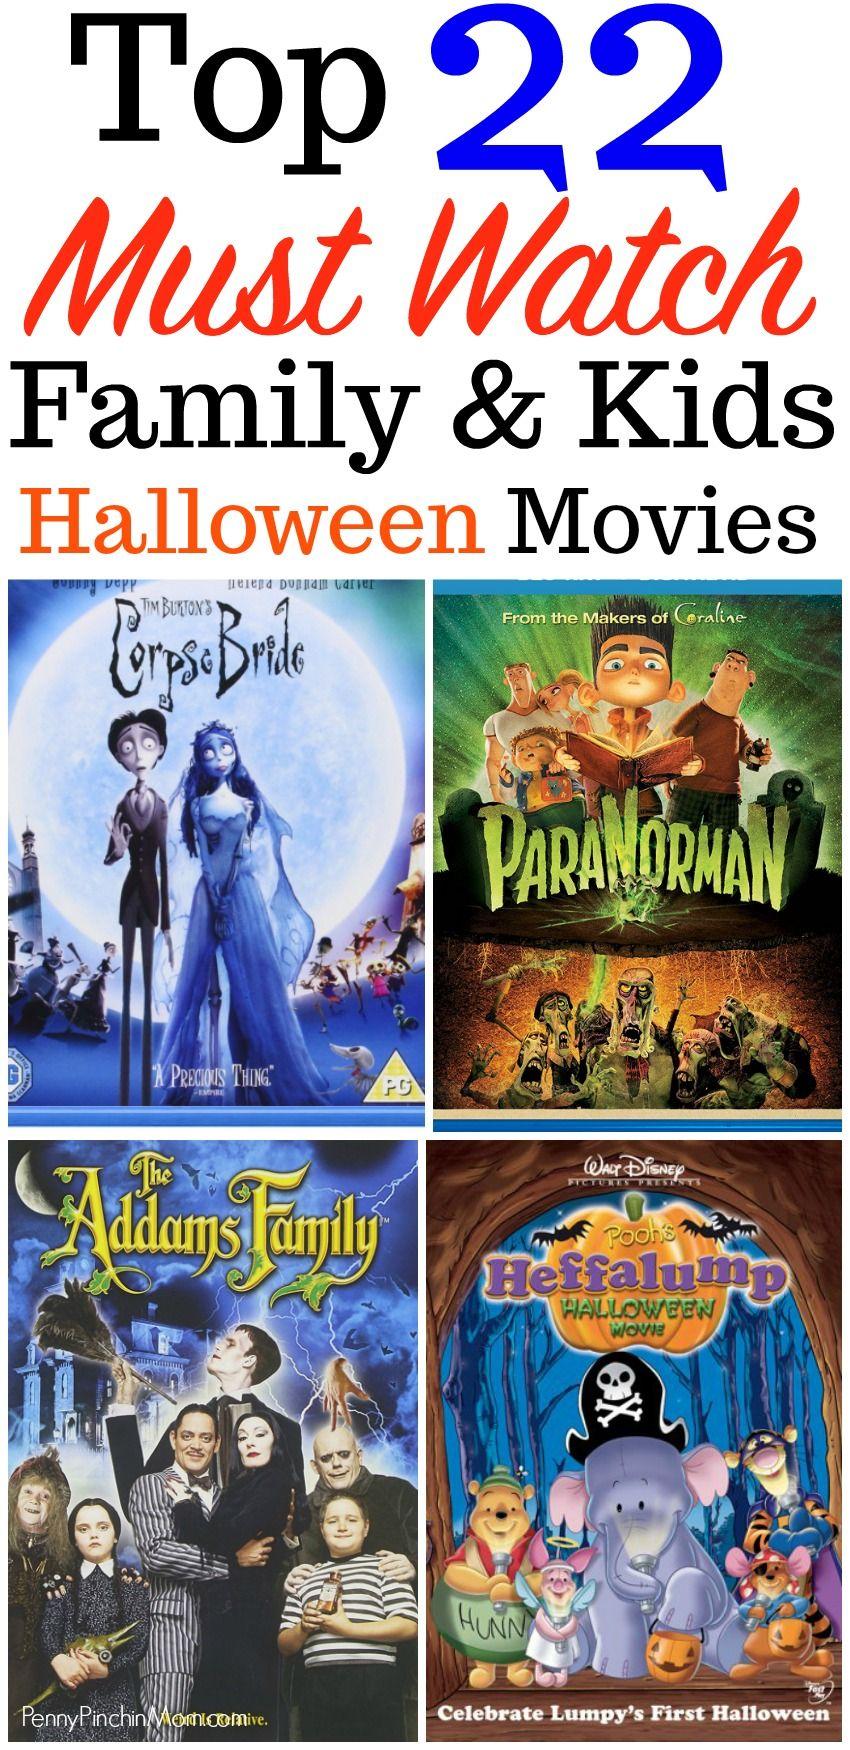 The Best Halloween Movies for Kids | Halloween movies, Halloween ...